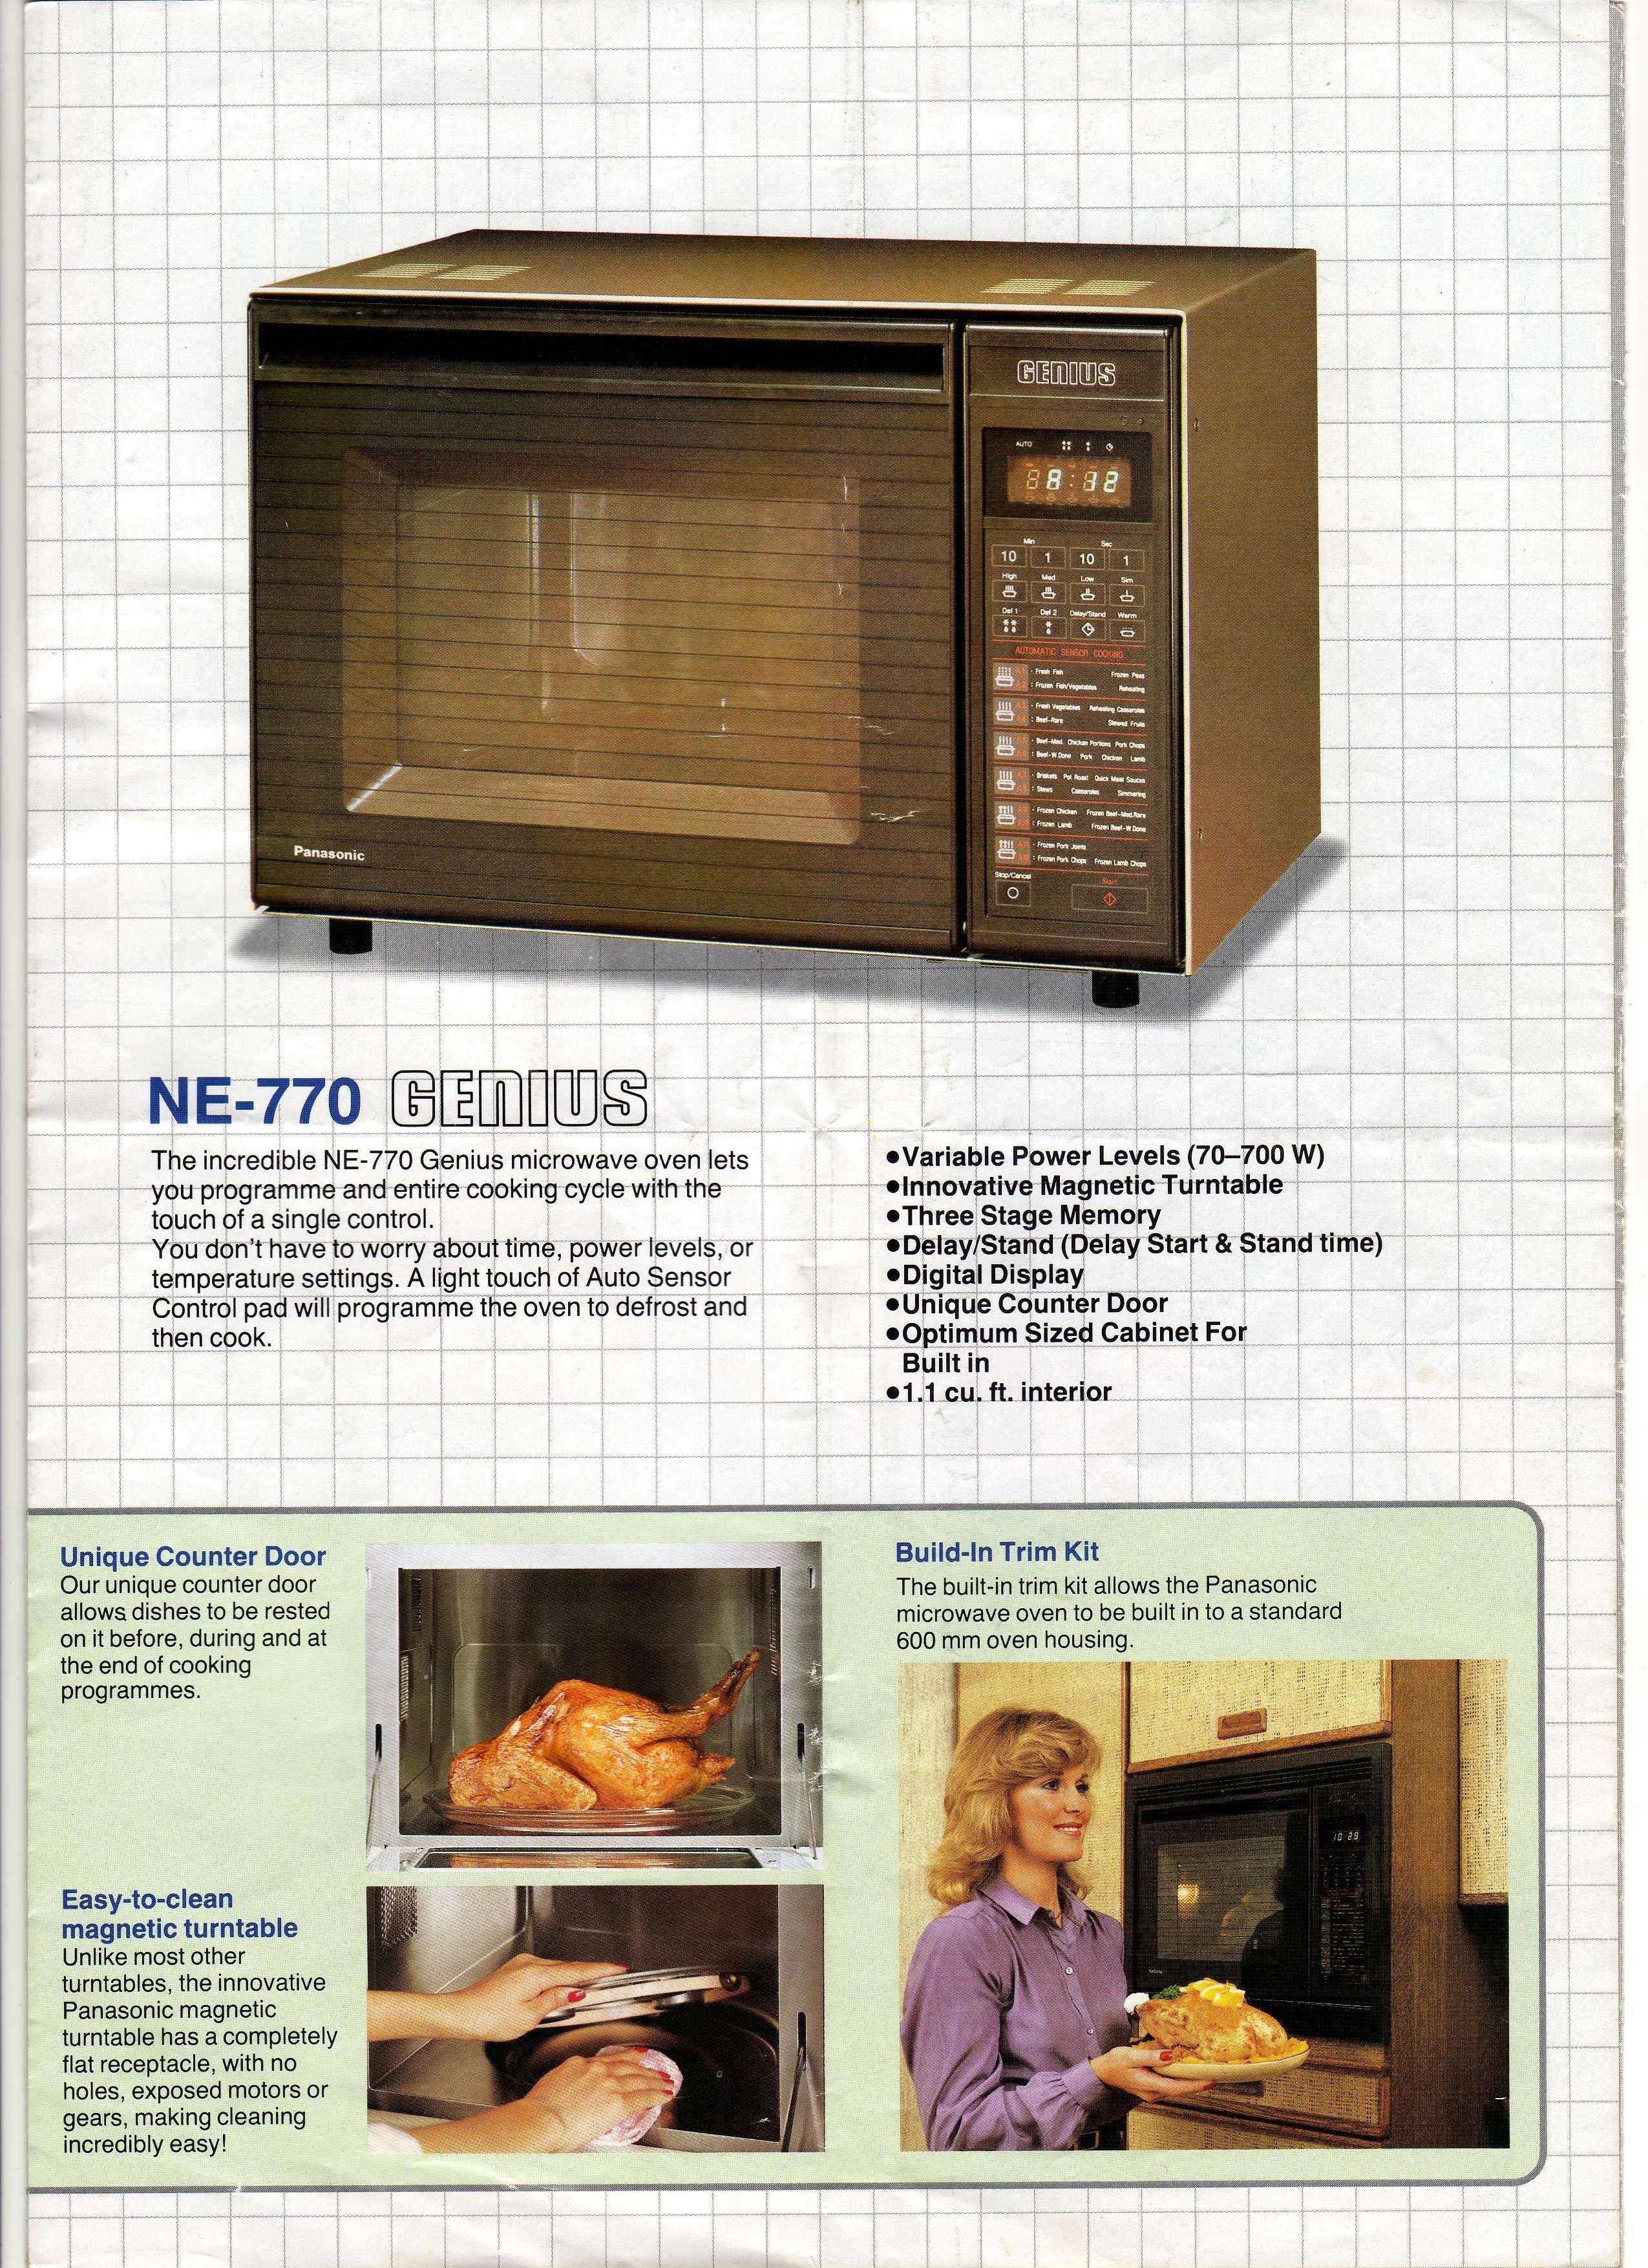 Vintage Panasonic Genius Ne 770 Microwave Oven Ad 1984